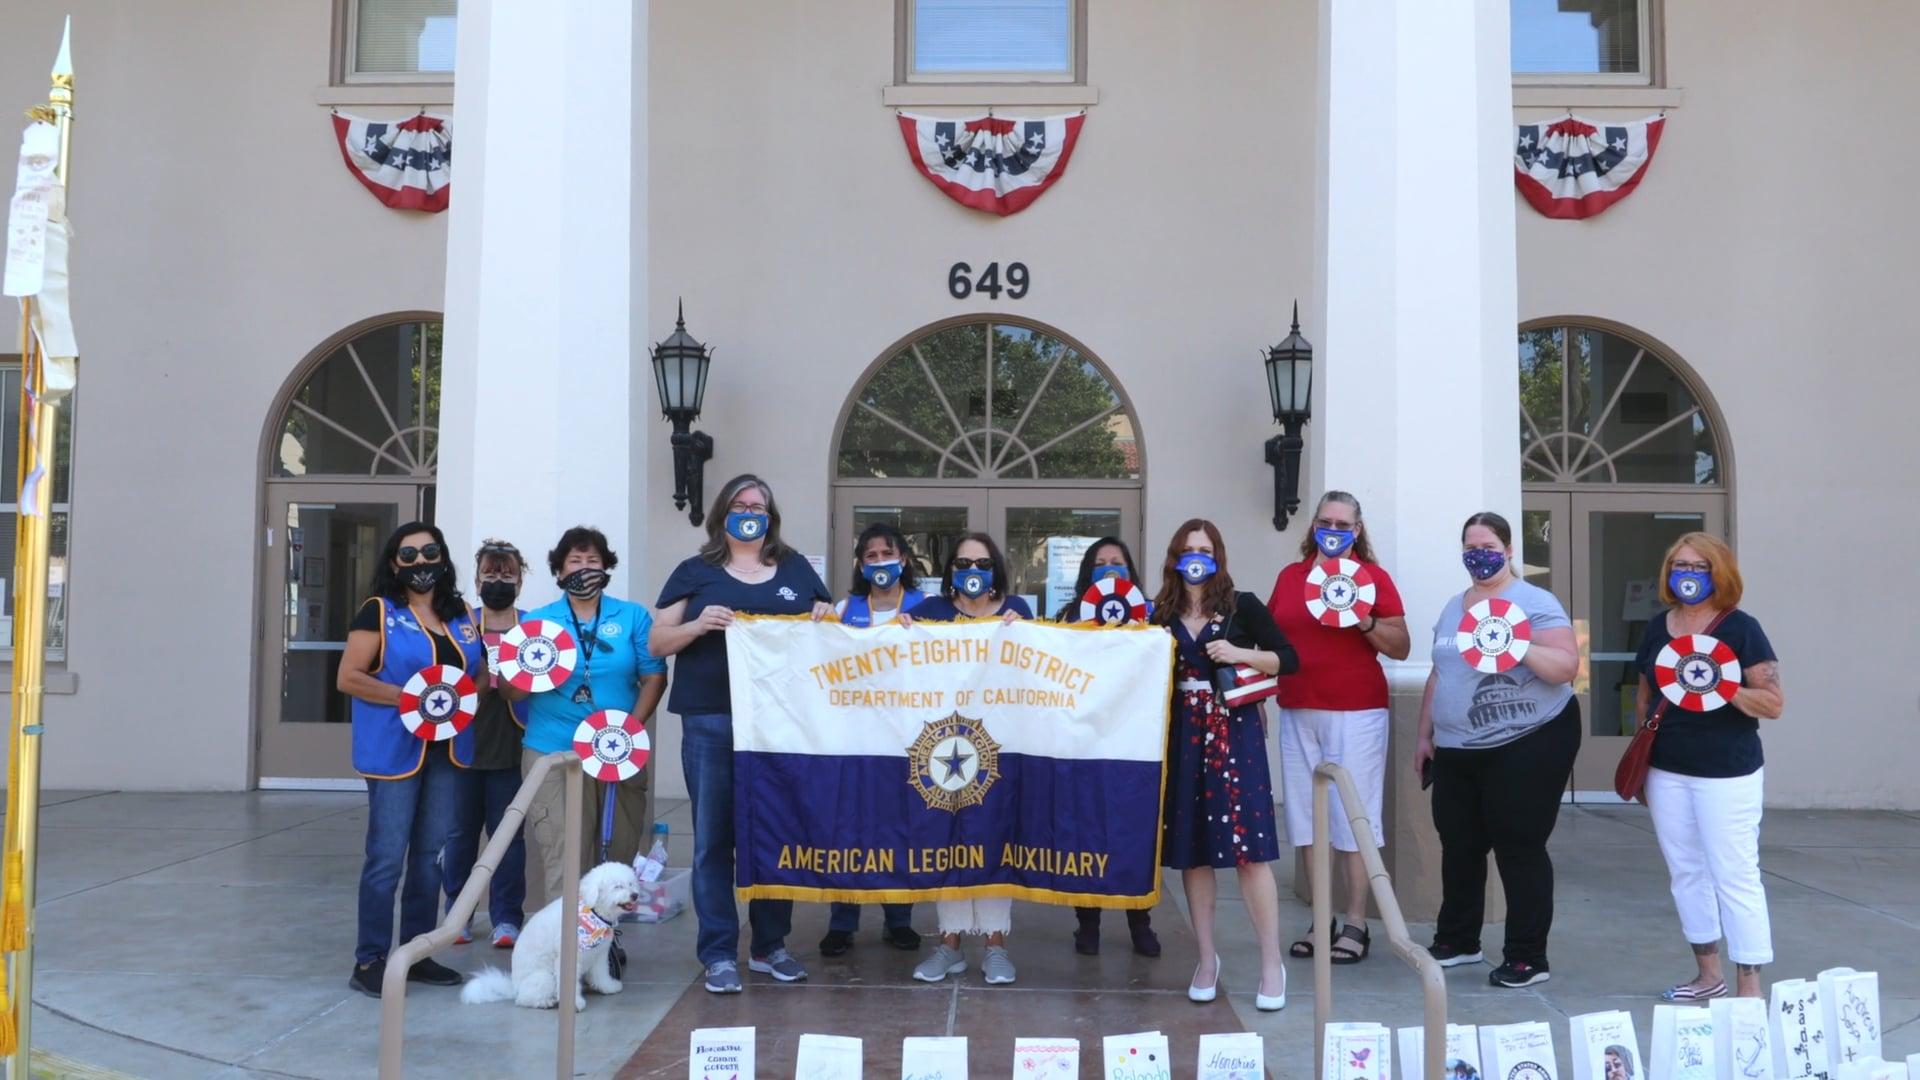 The Americal Legion Auxiliary